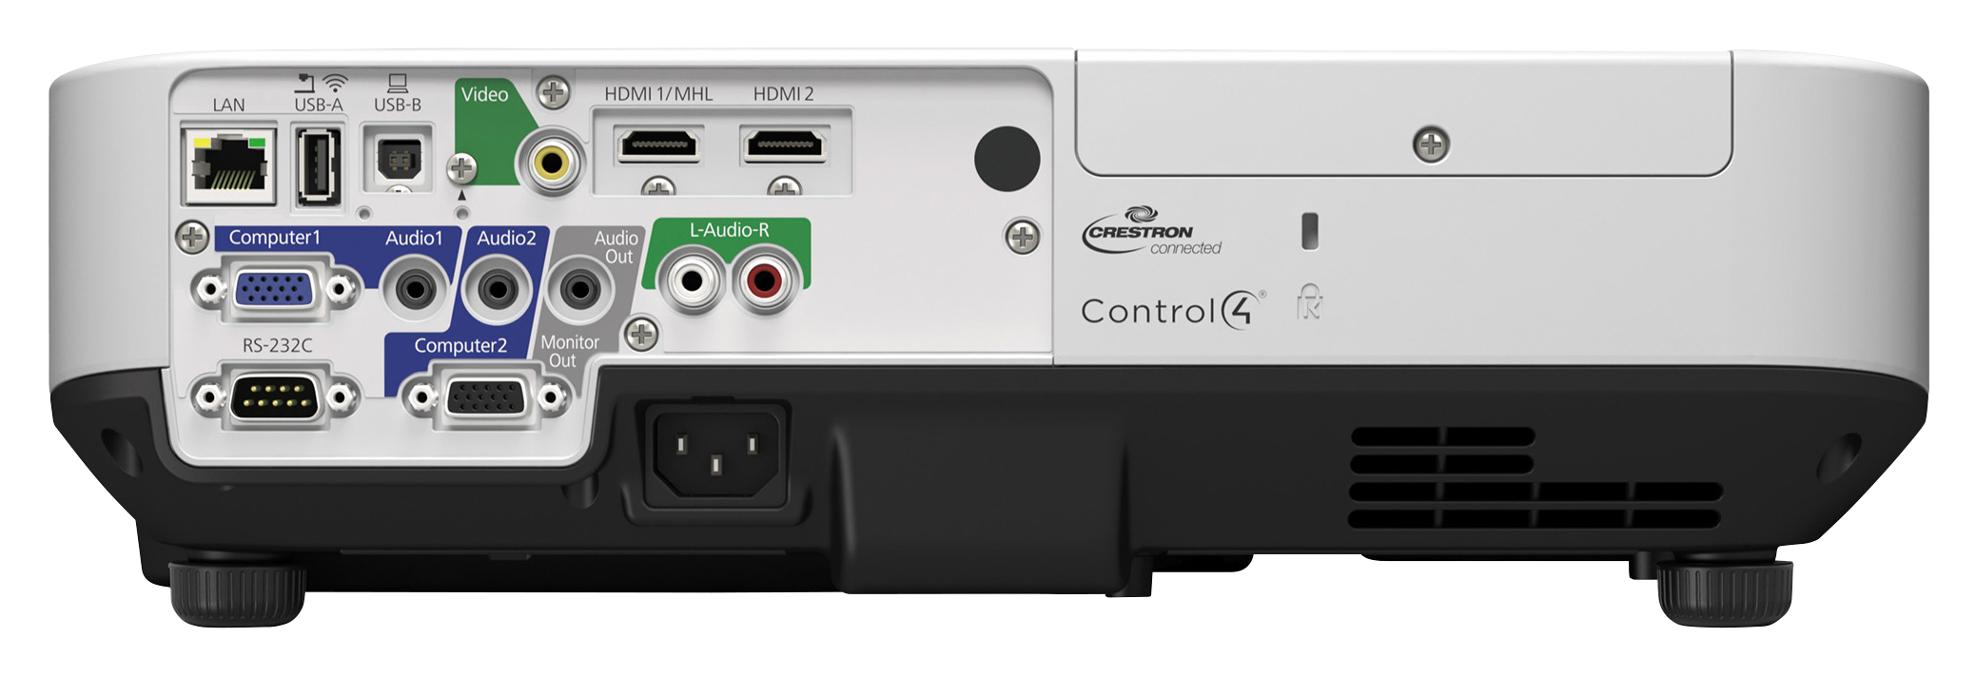 4200 Lumen XGA 3LCD Projector